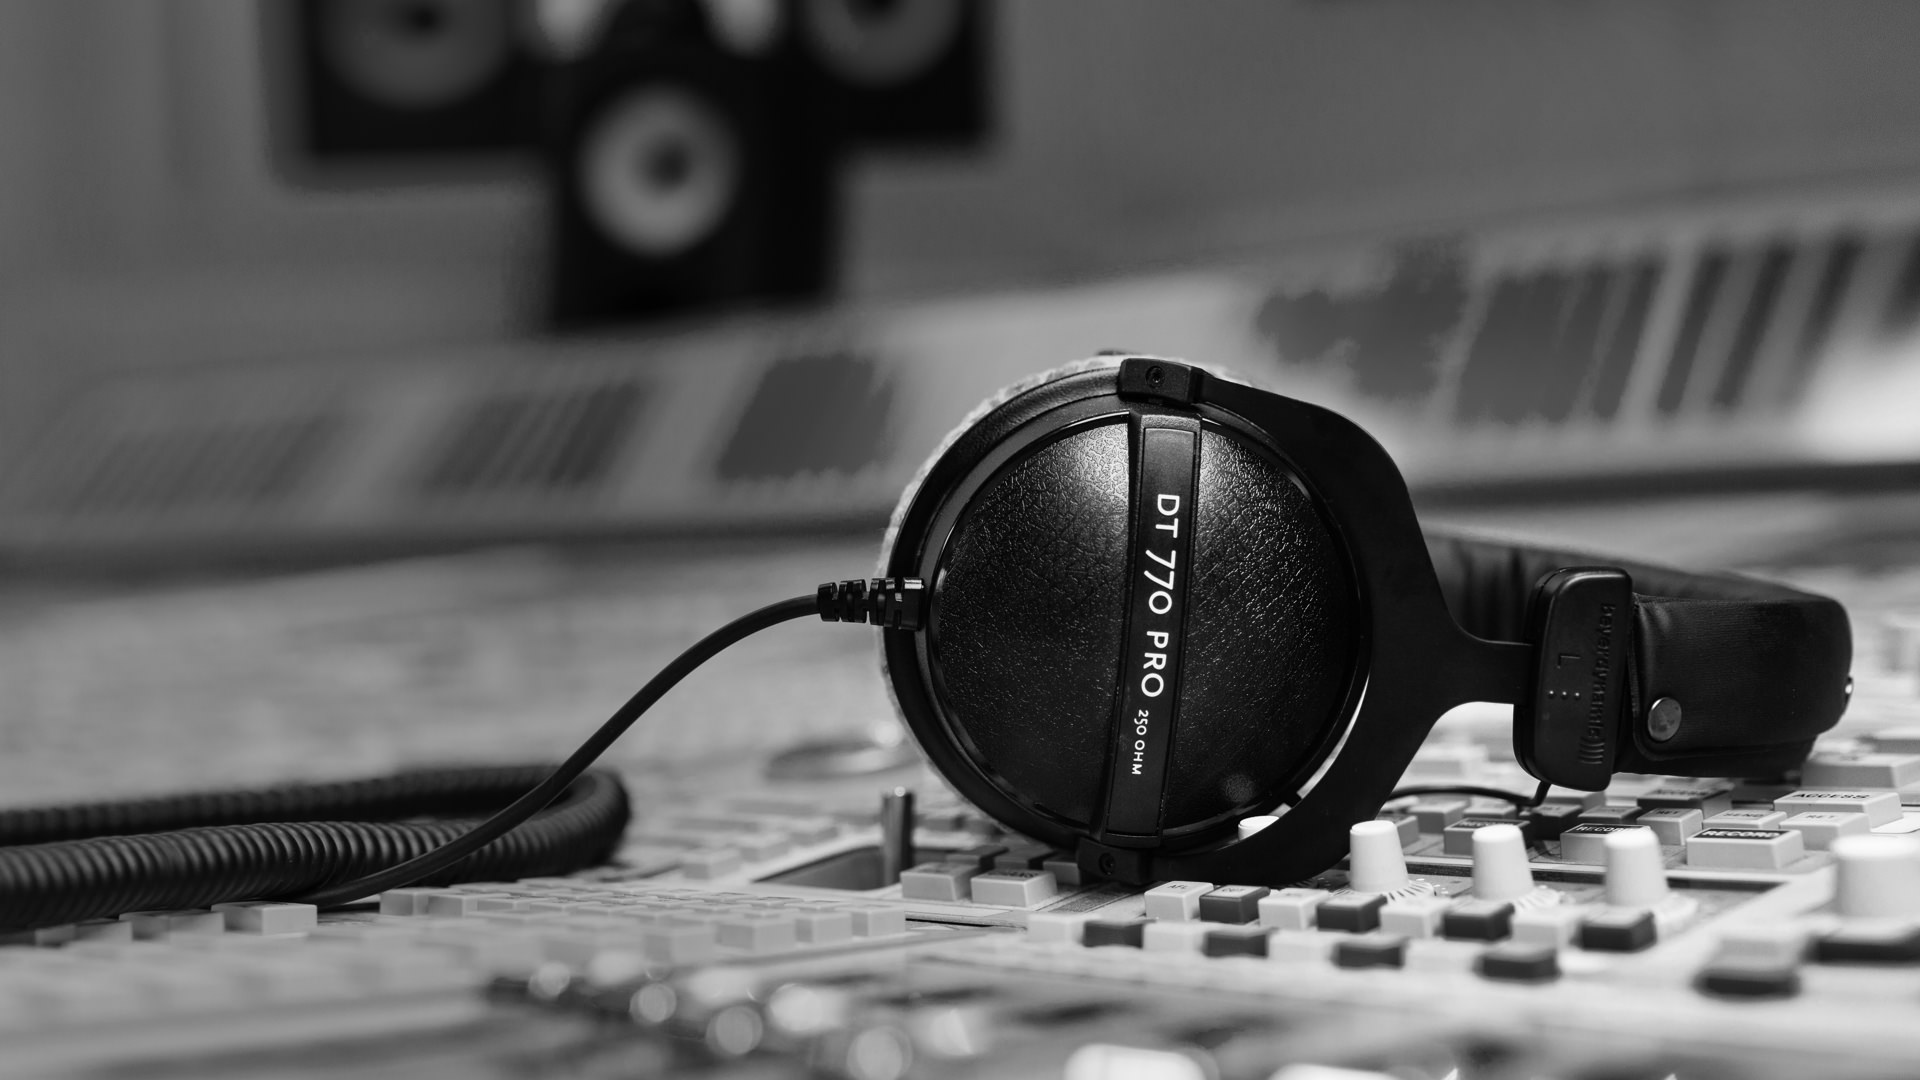 beyerdynamic DT 770 PRO 80 Ohm Closed Studio Headphones | MUSIC STORE  professional | en-TR